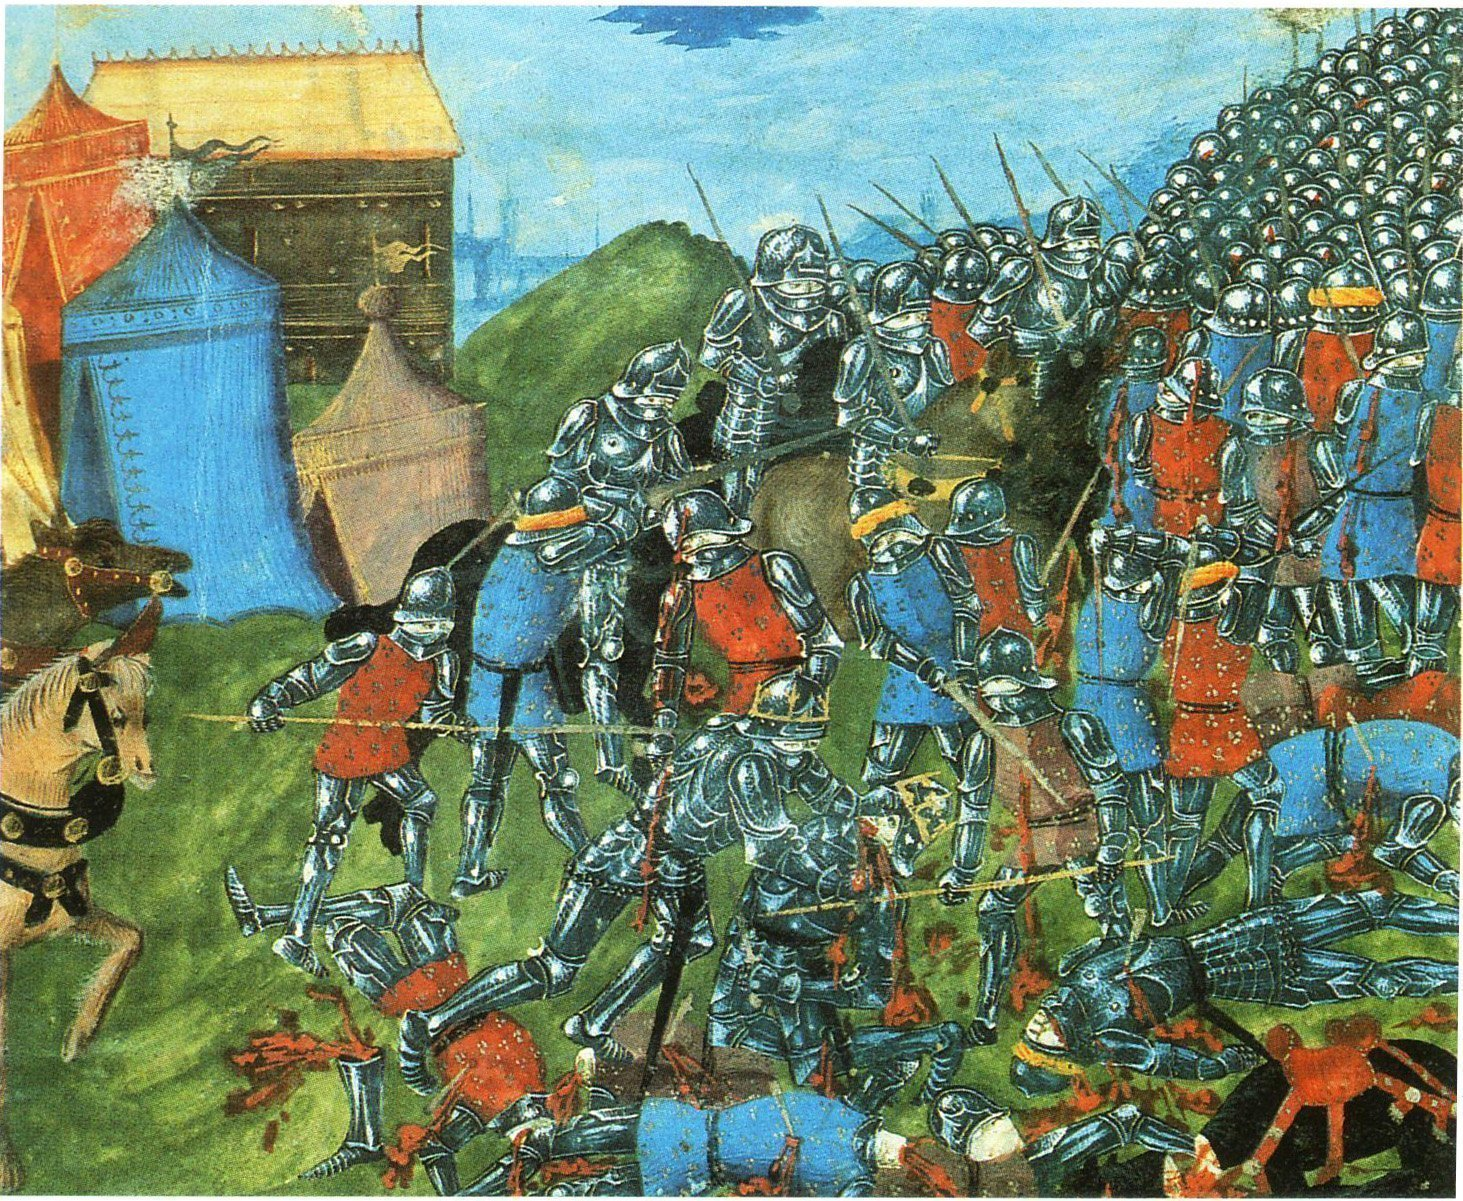 Битва при Вуйе, или как начался путь от Галлии к Франции